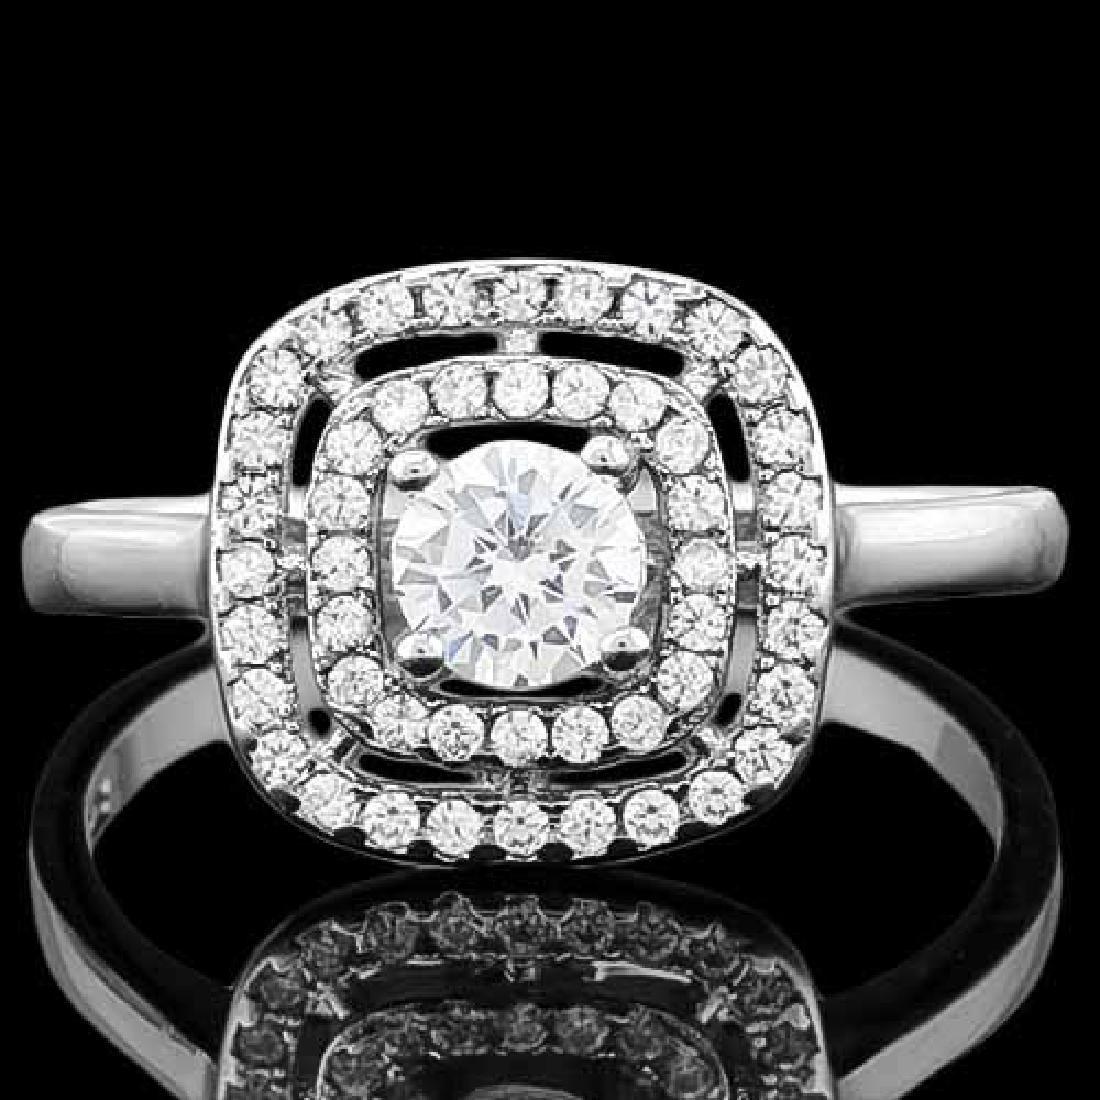 1 CARAT (53 PCS) FLAWLESS CREATED DIAMOND 925 STERLING